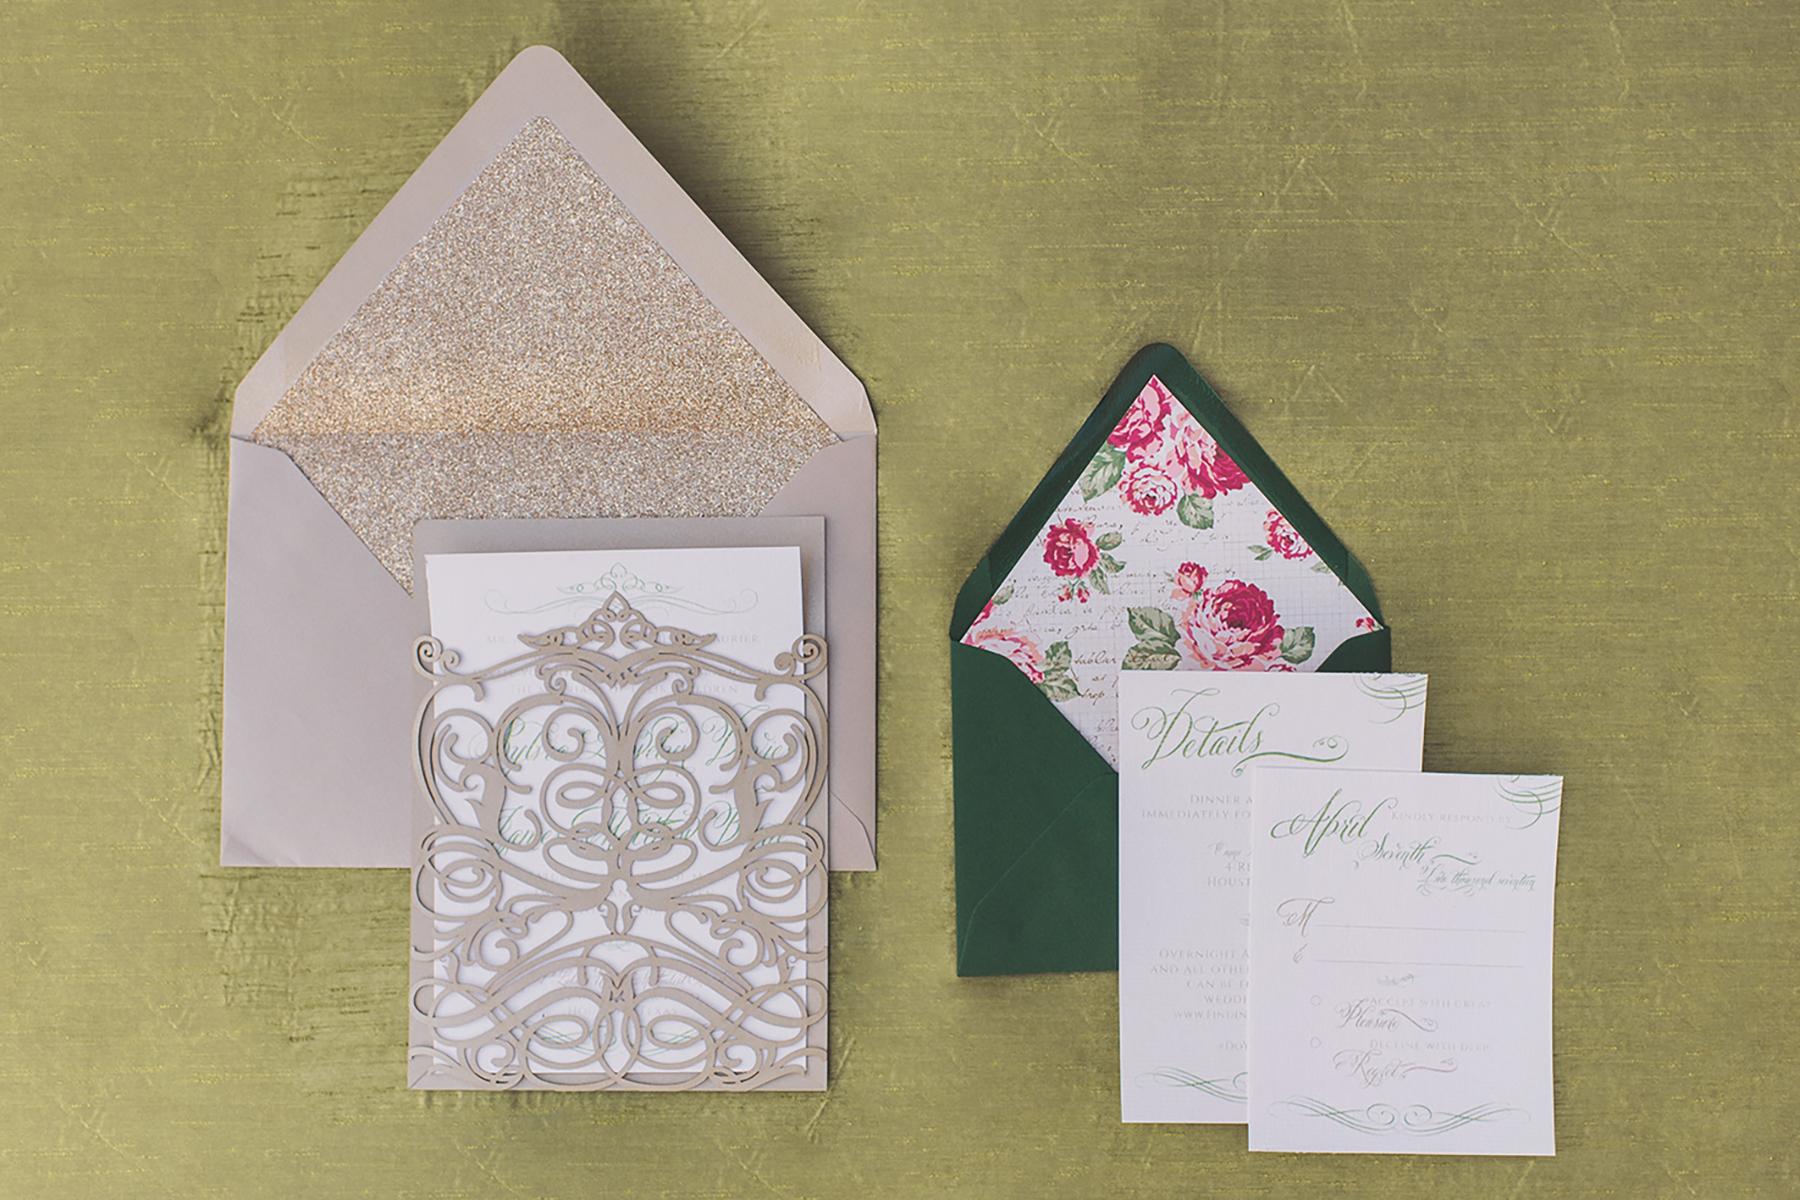 daytoremember.net | Lindsay Elizabeth Photography | Wedding Stationery | A Day To Remember Houston Wedding Planning and Design